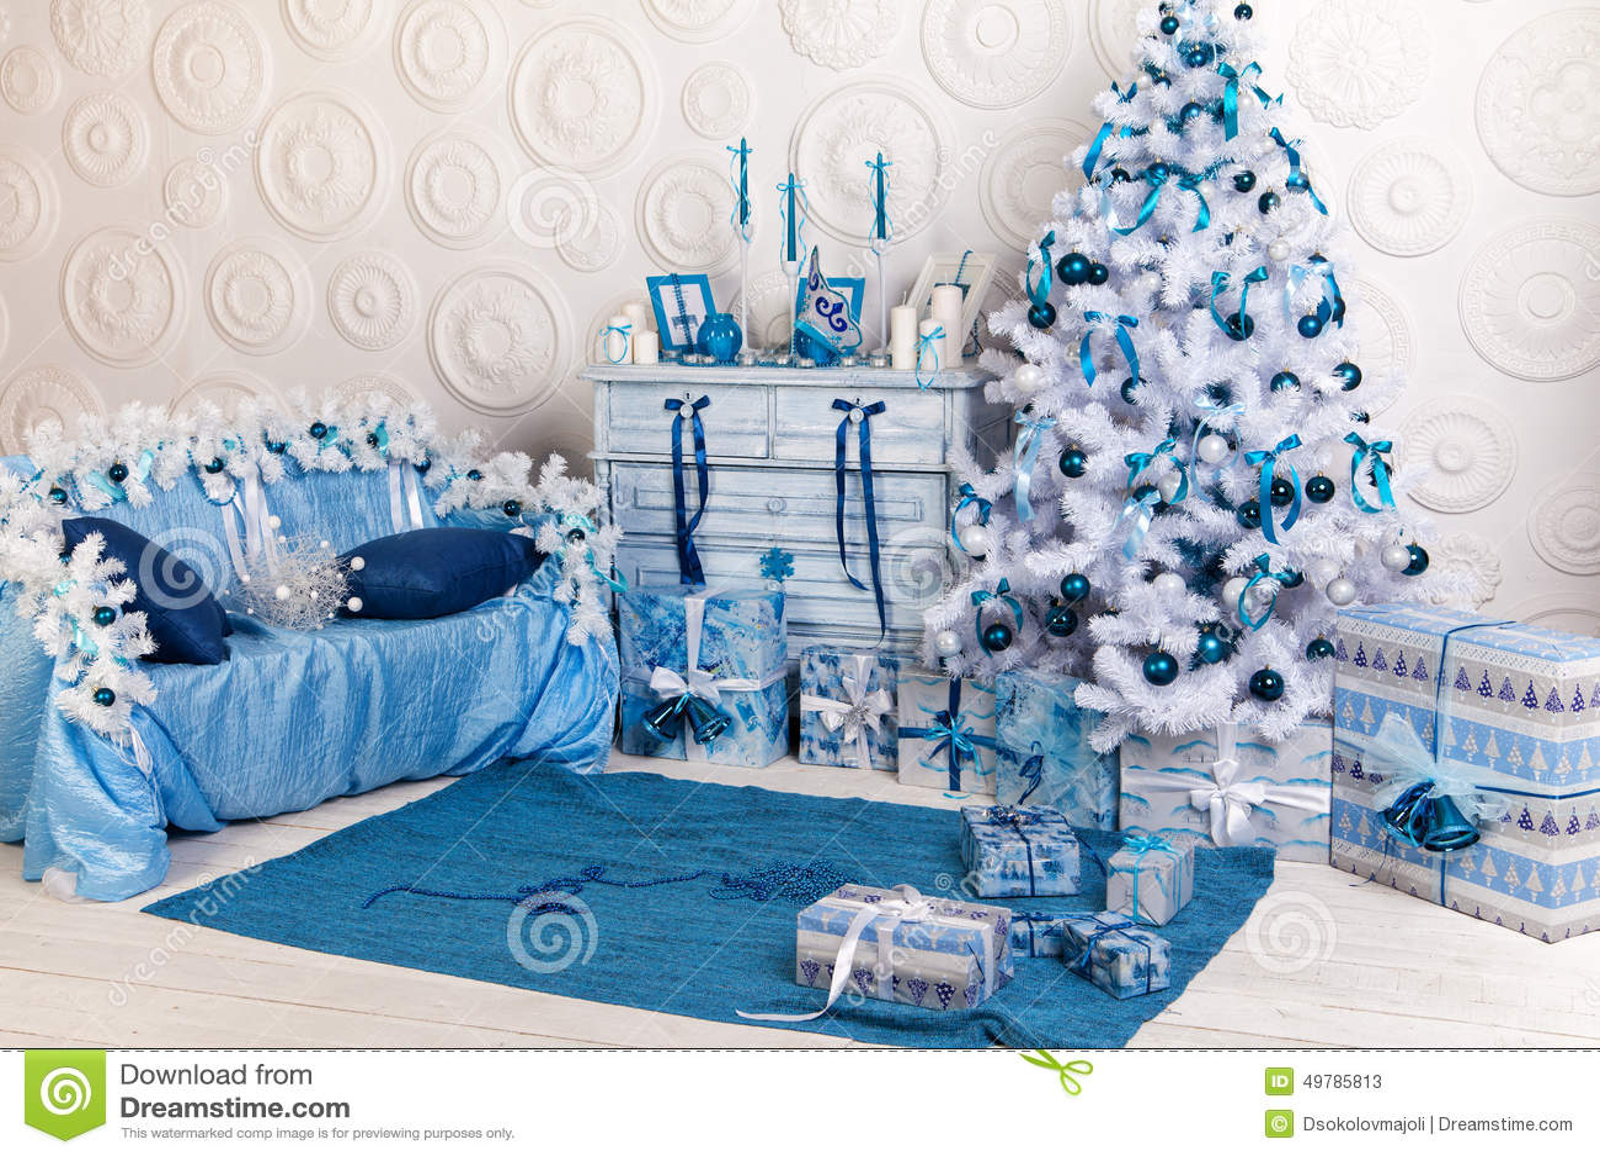 #0E253E Festive Interior Decoration For Christmas In Blue And  5343 decorations de noel bleues 1300x957 px @ aertt.com